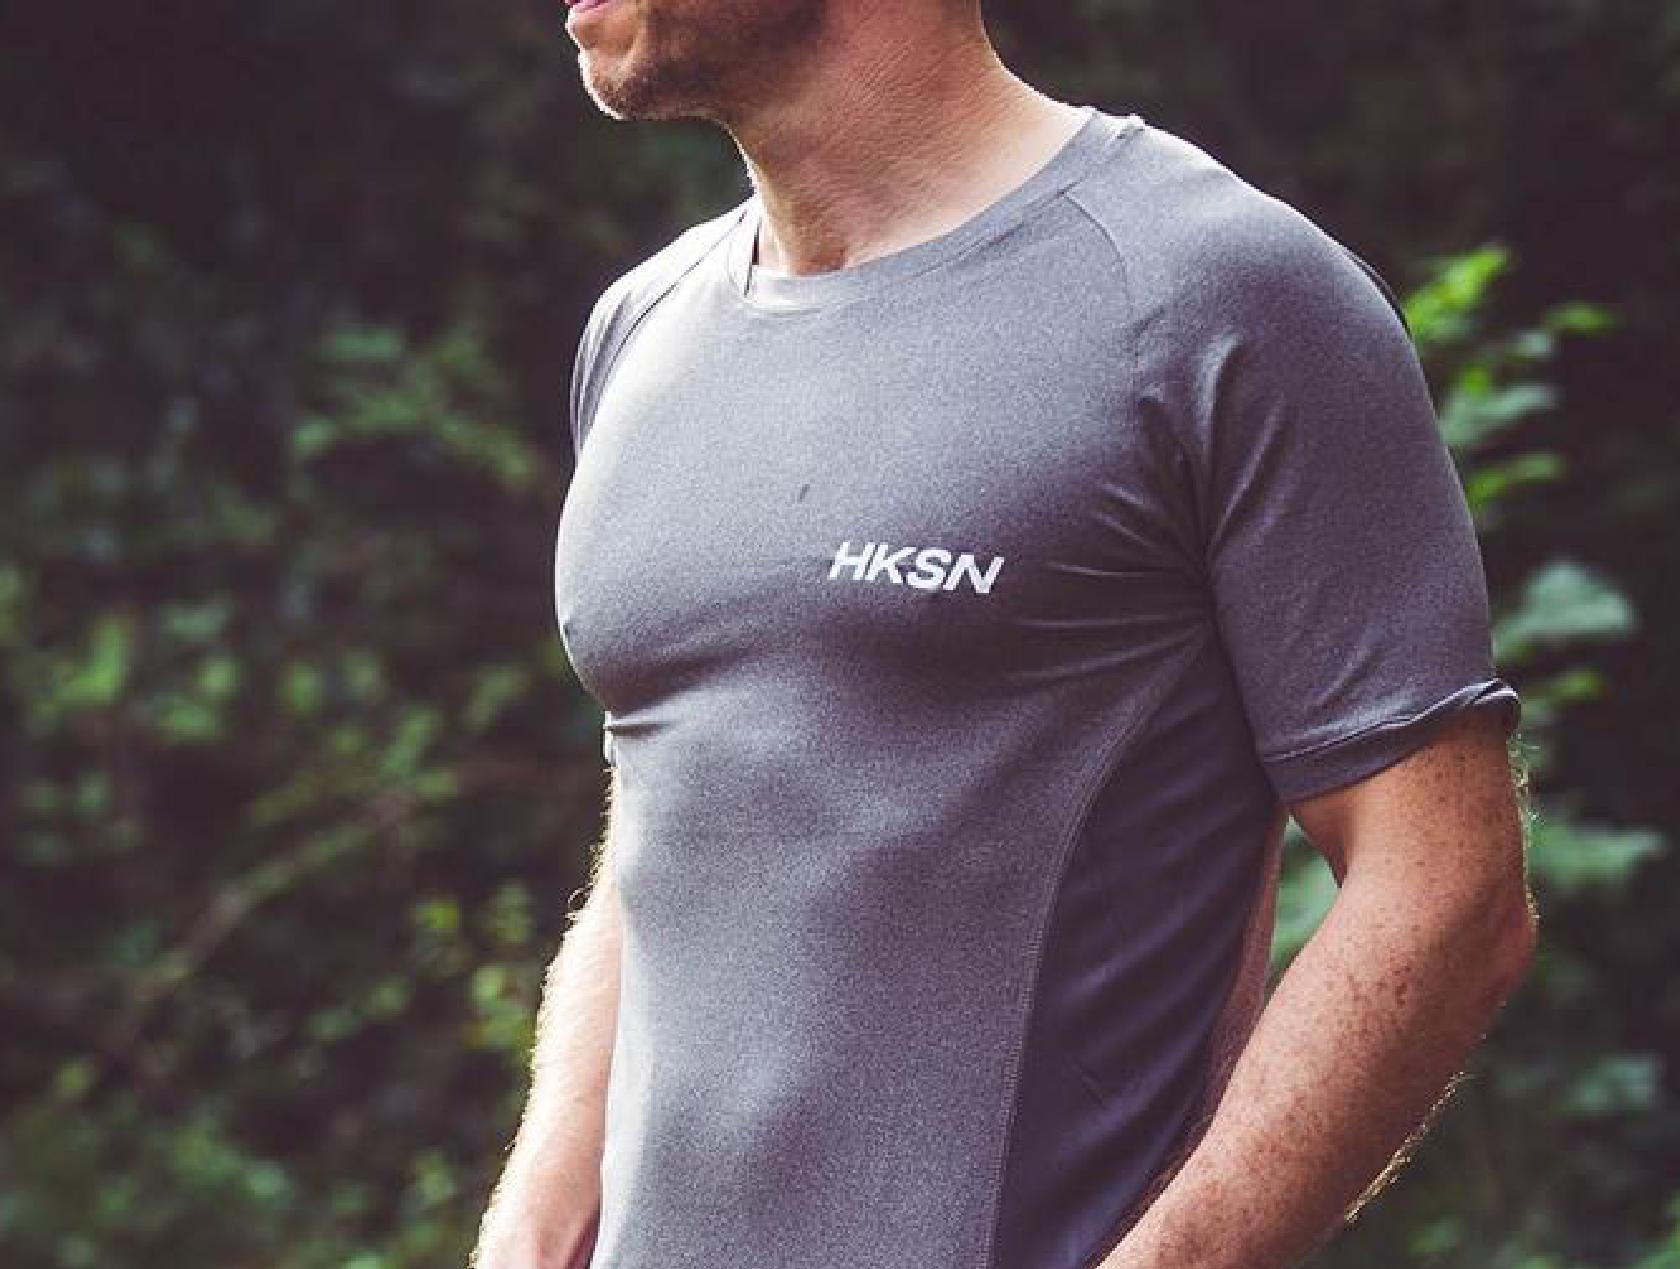 Huckson t-shirt